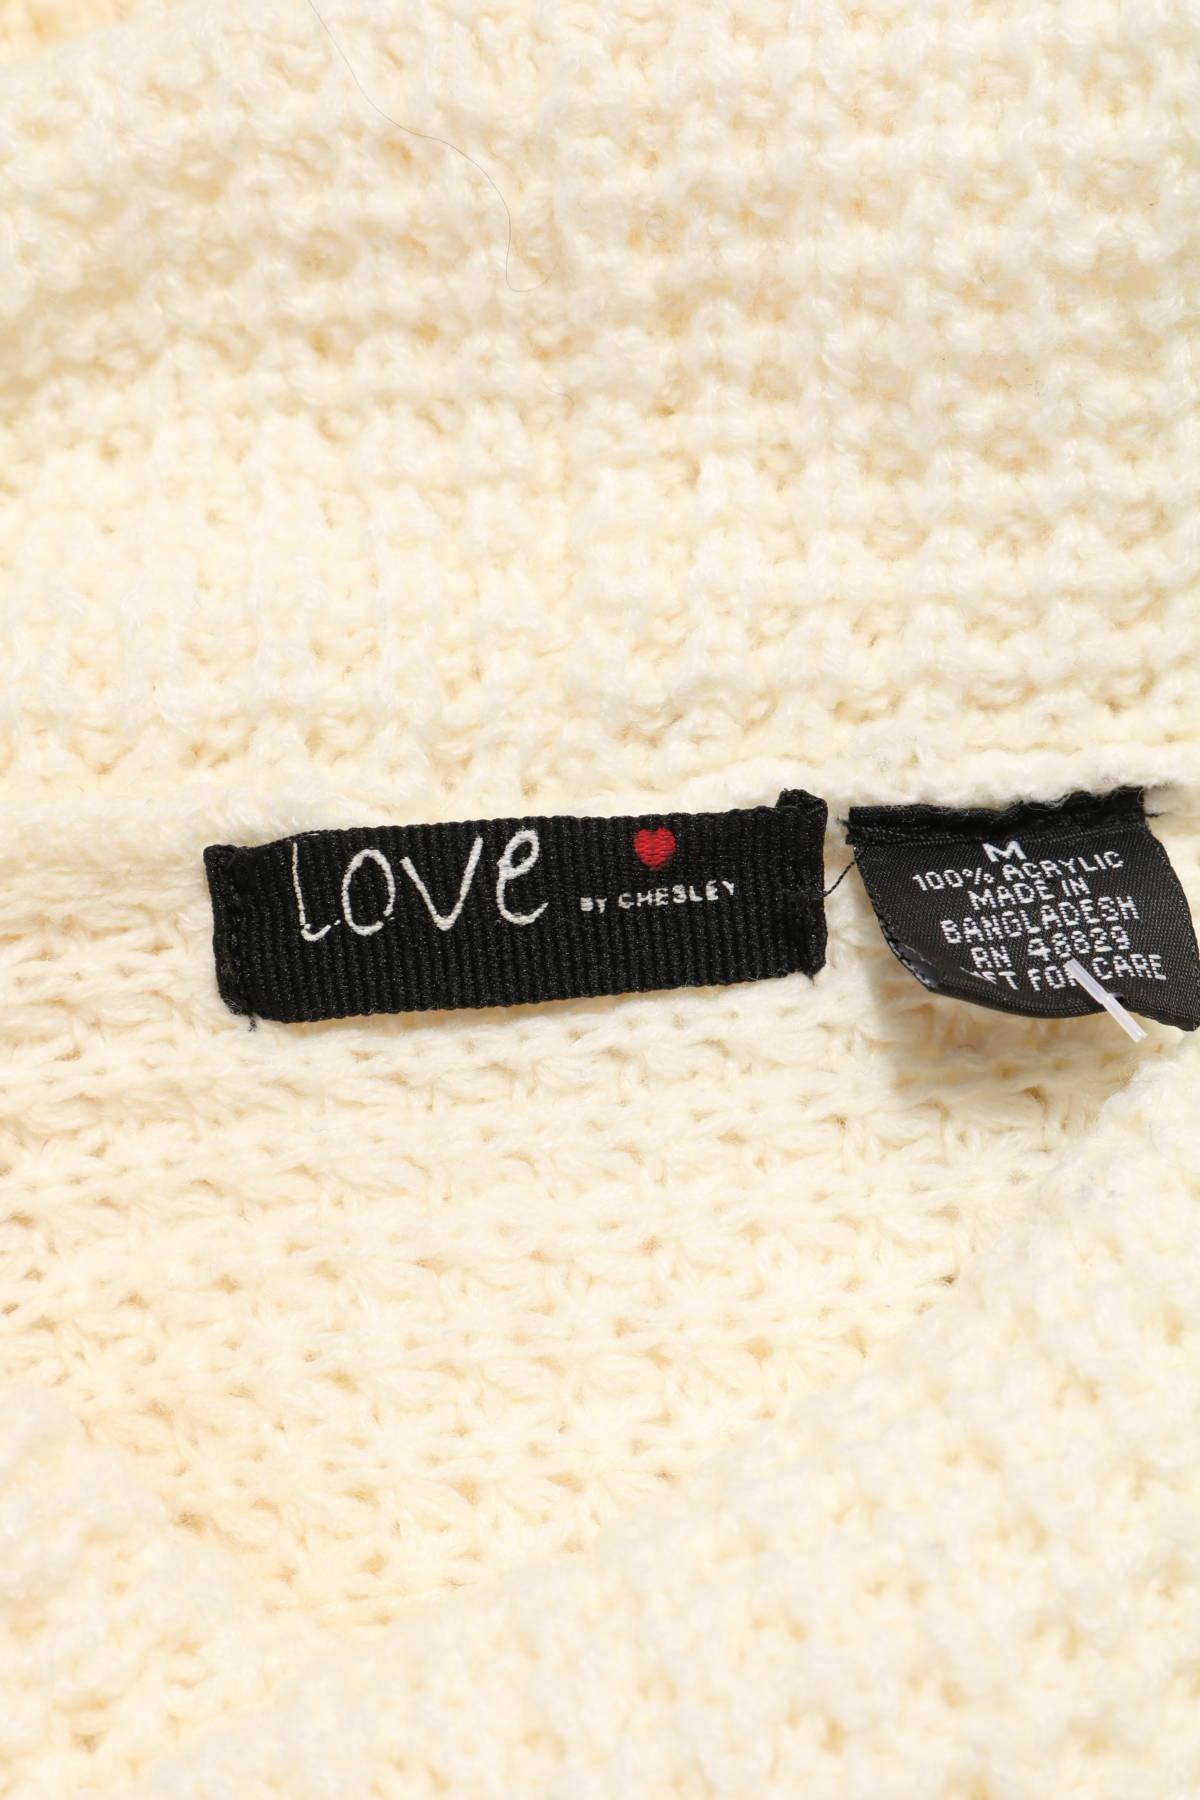 Пуловер с поло яка LOVE CHESLEY3